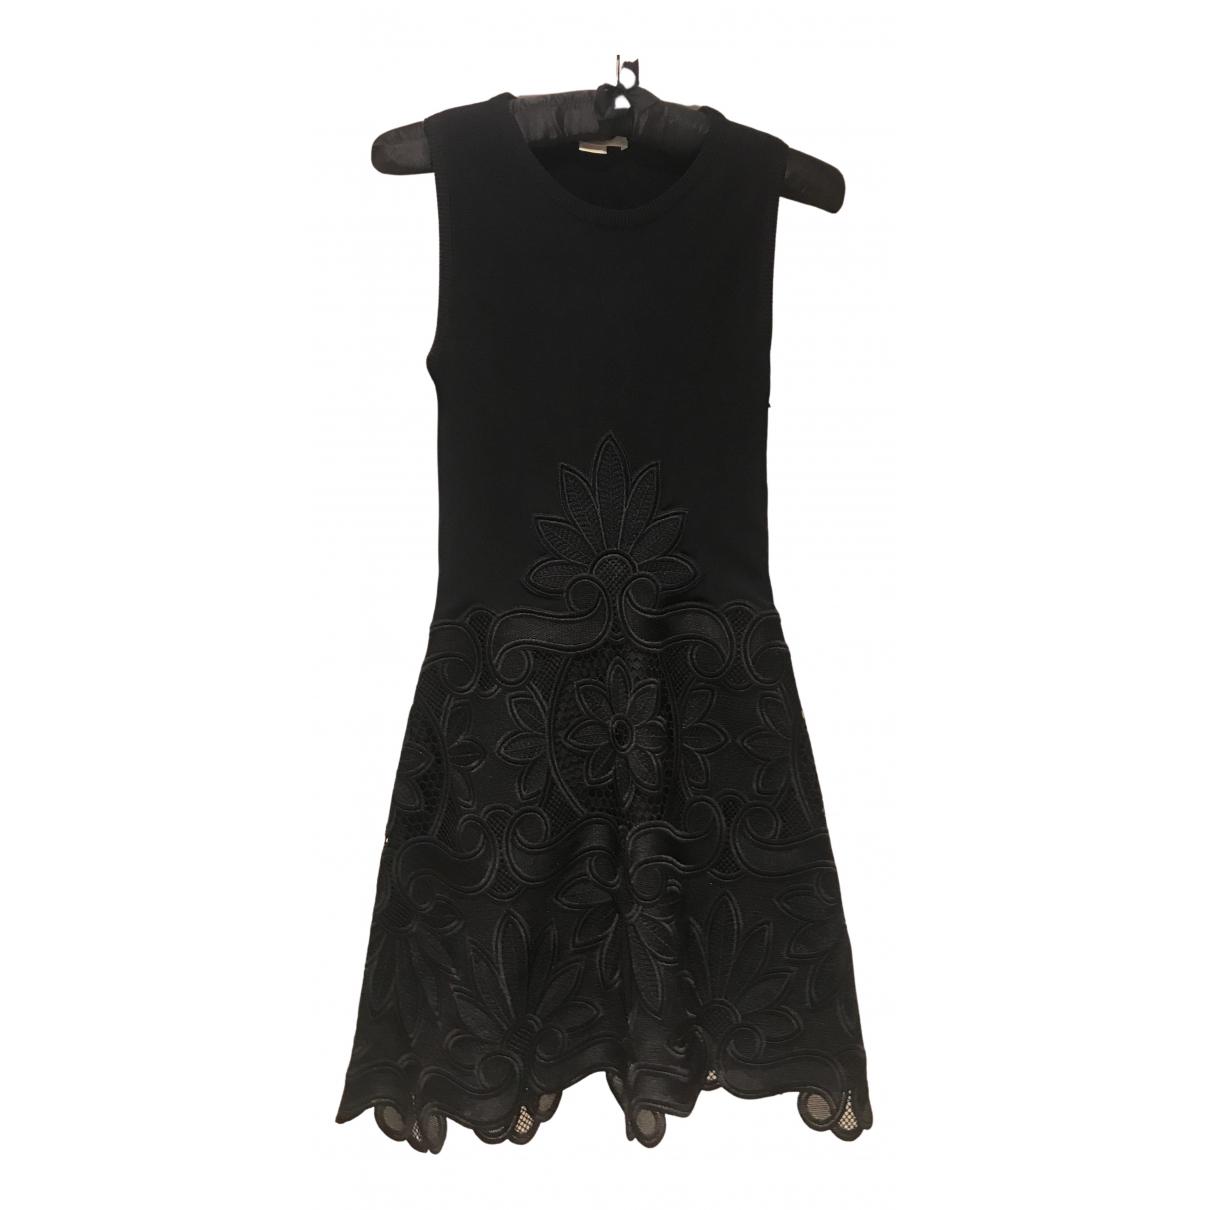 Antonio Berardi \N Kleid in  Schwarz Synthetik